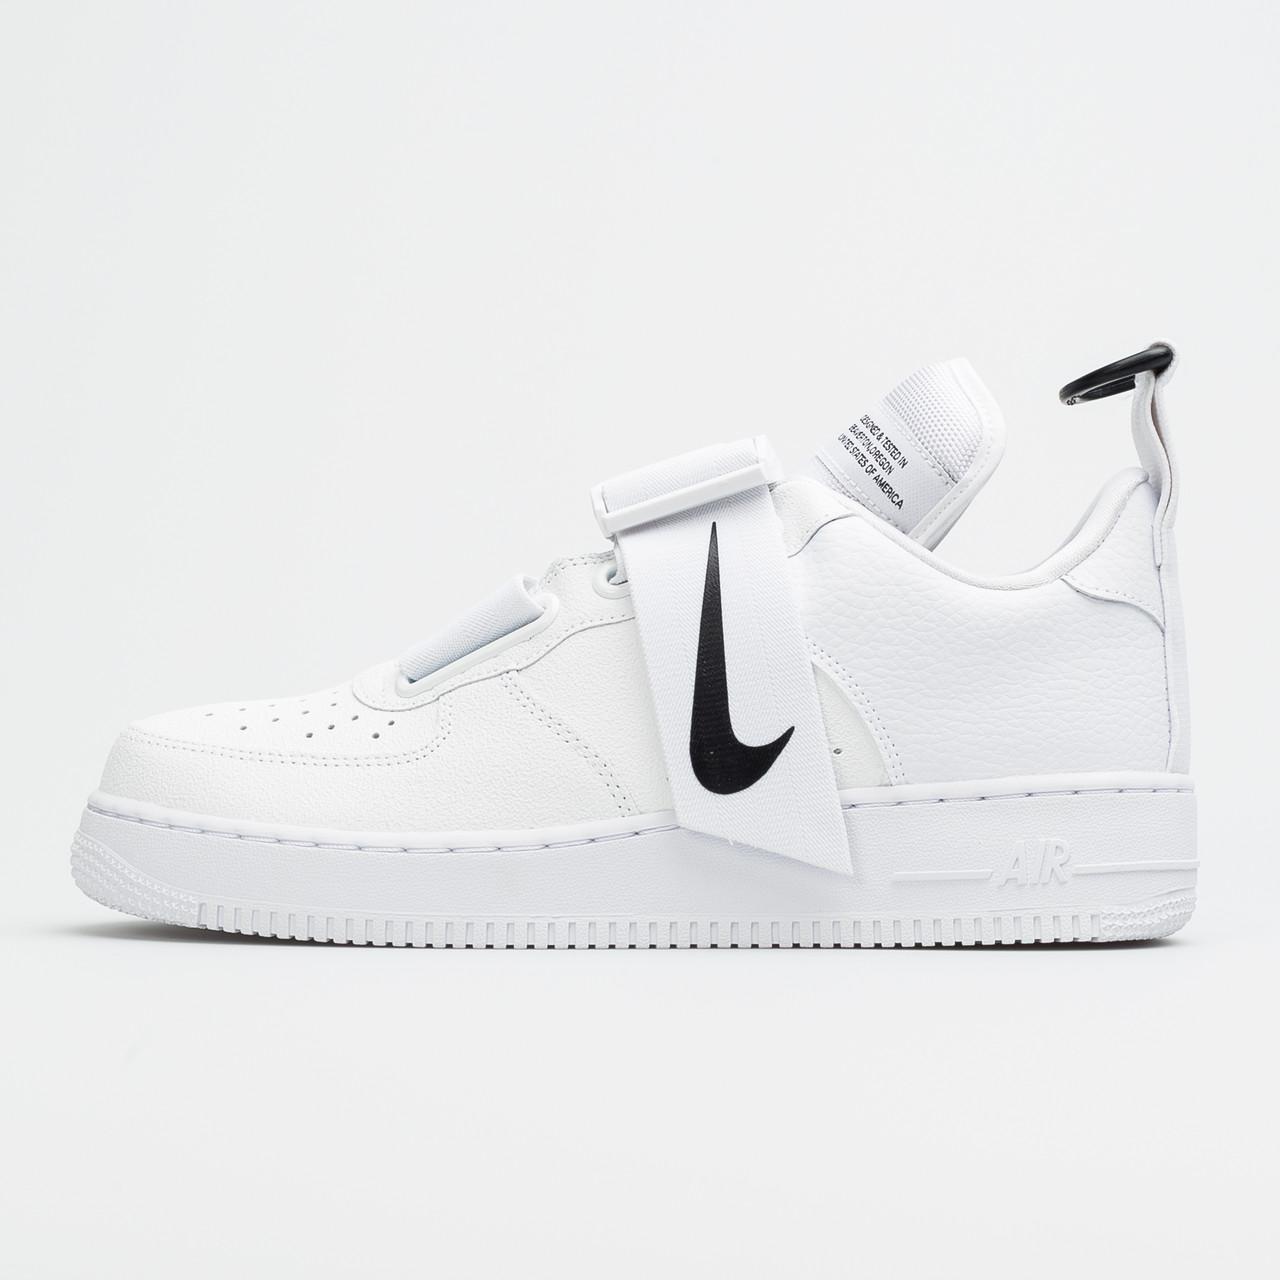 240ddb7e Оригинальные мужские кроссовки Nike Air Force 1 Utility: продажа ...